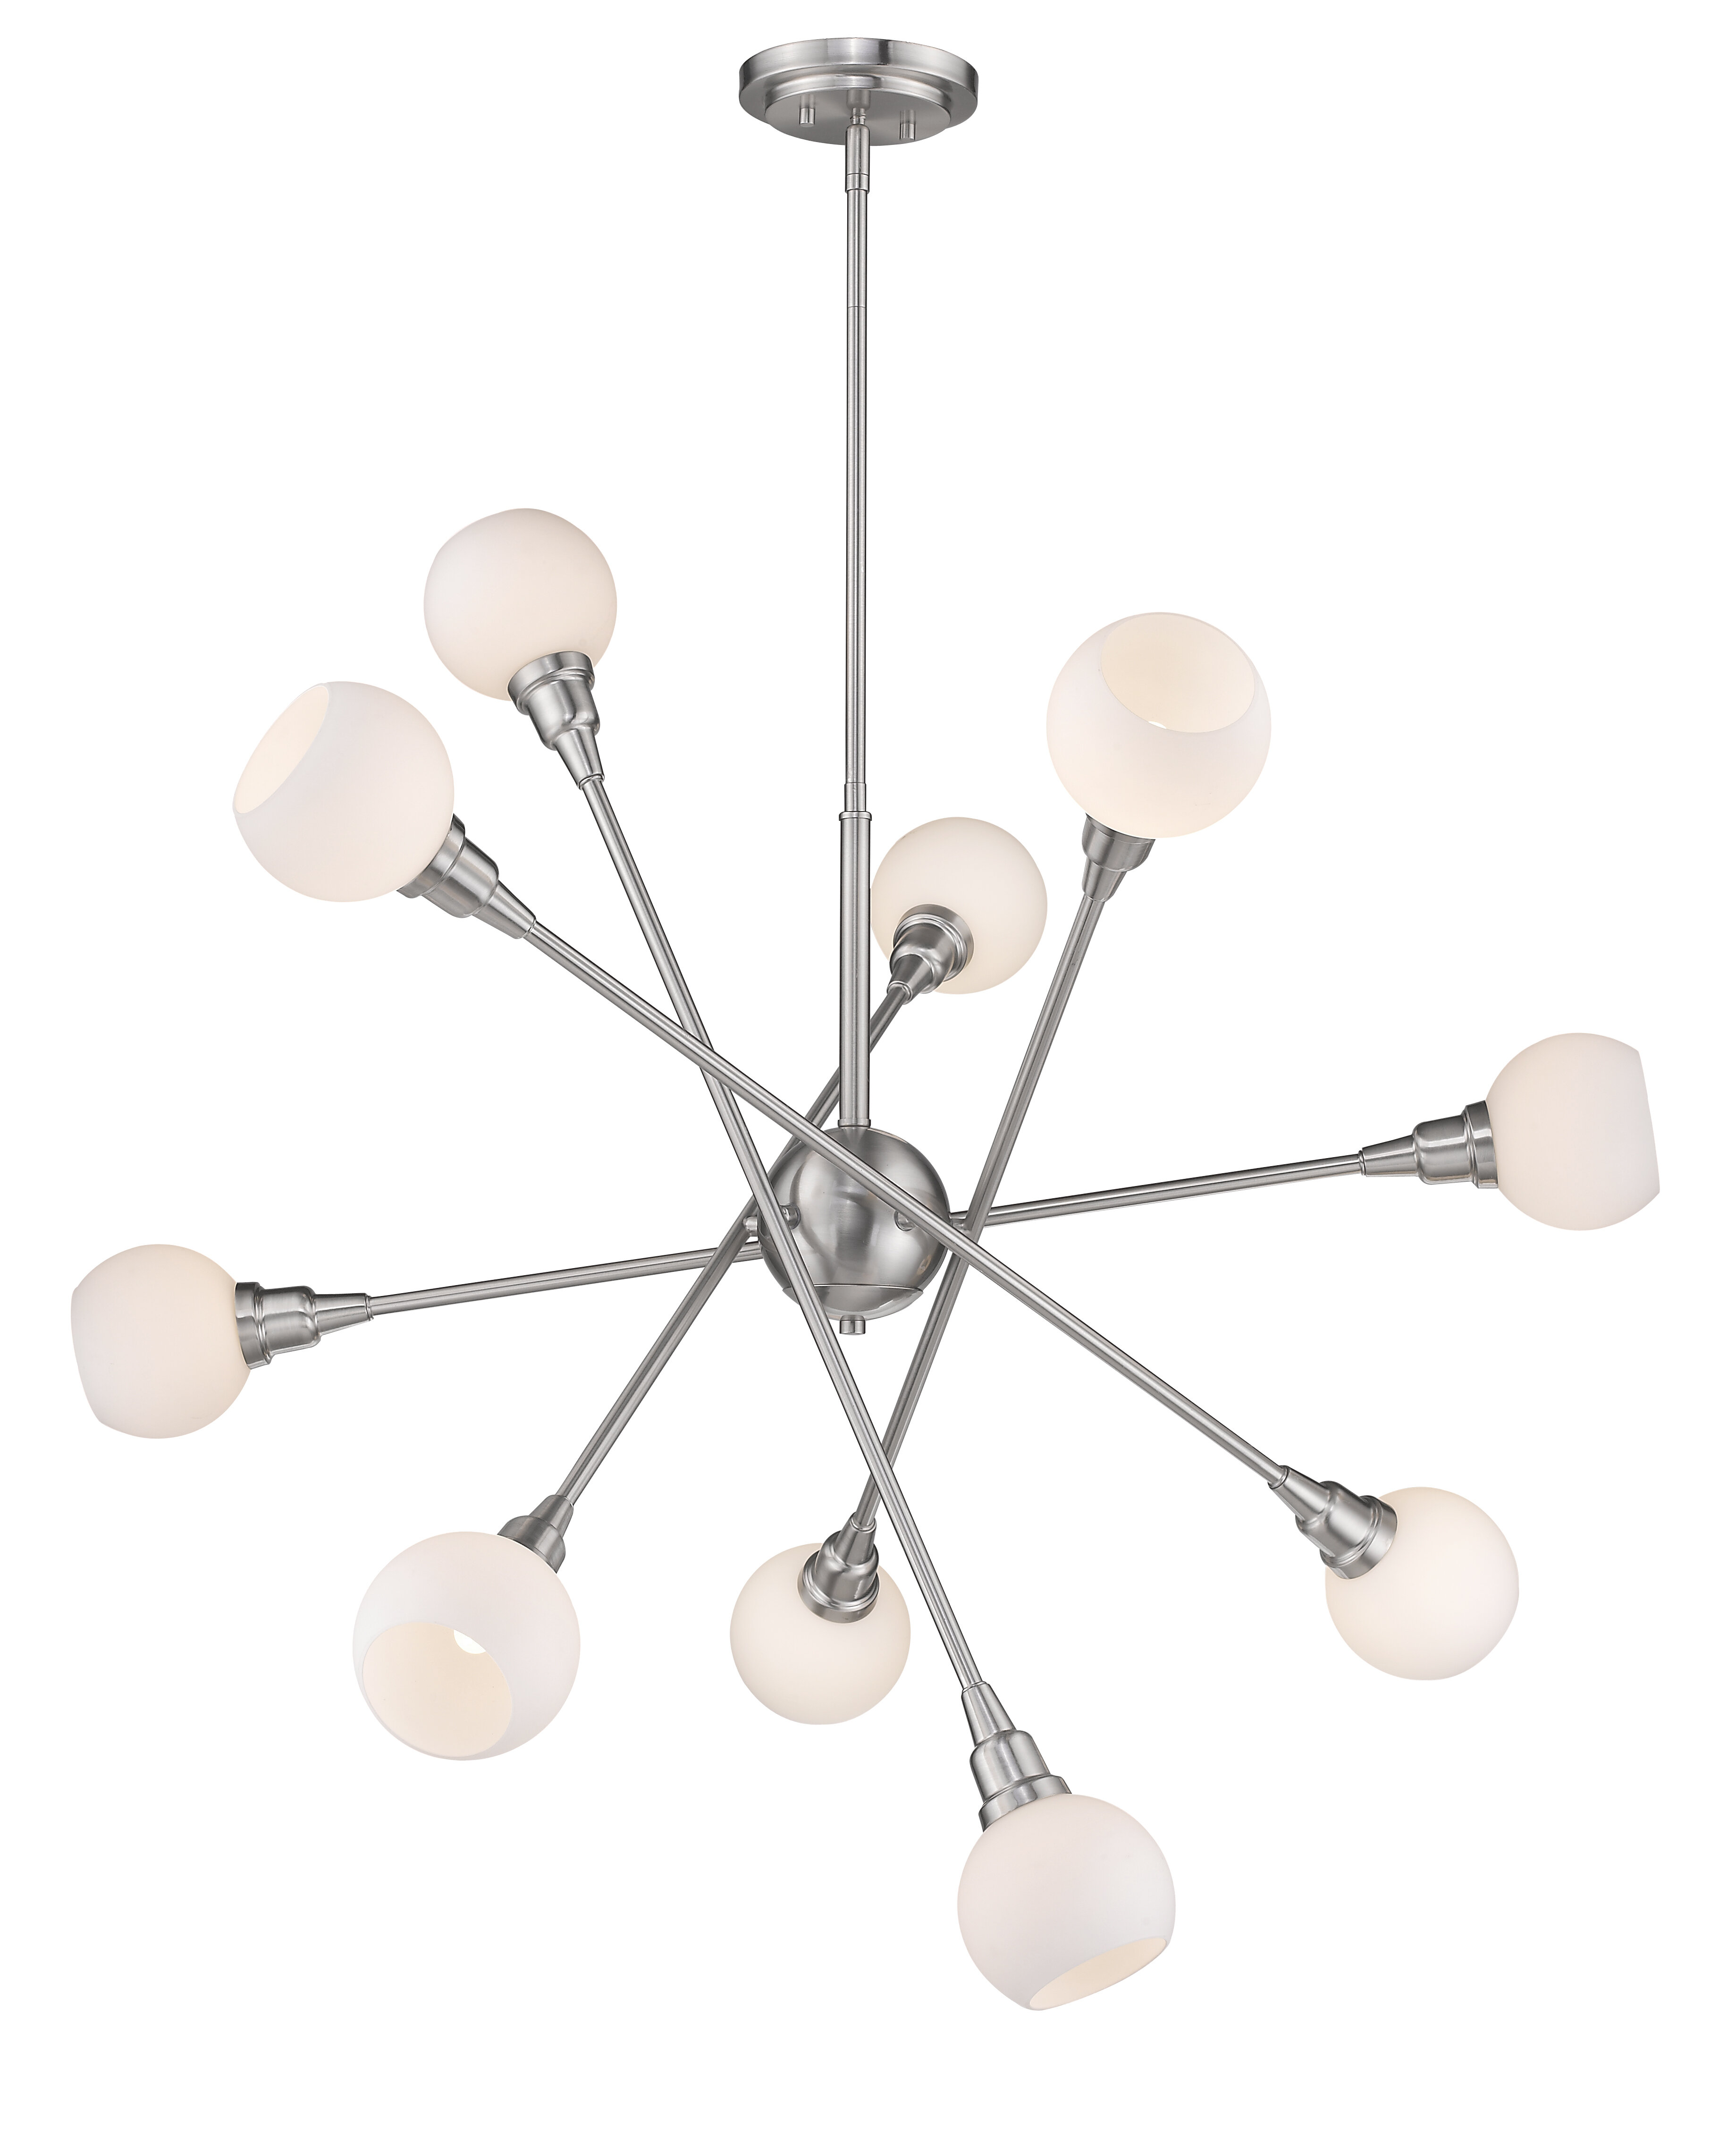 Brayden Studio Silvernail 10 Light Sputnik Chandelier